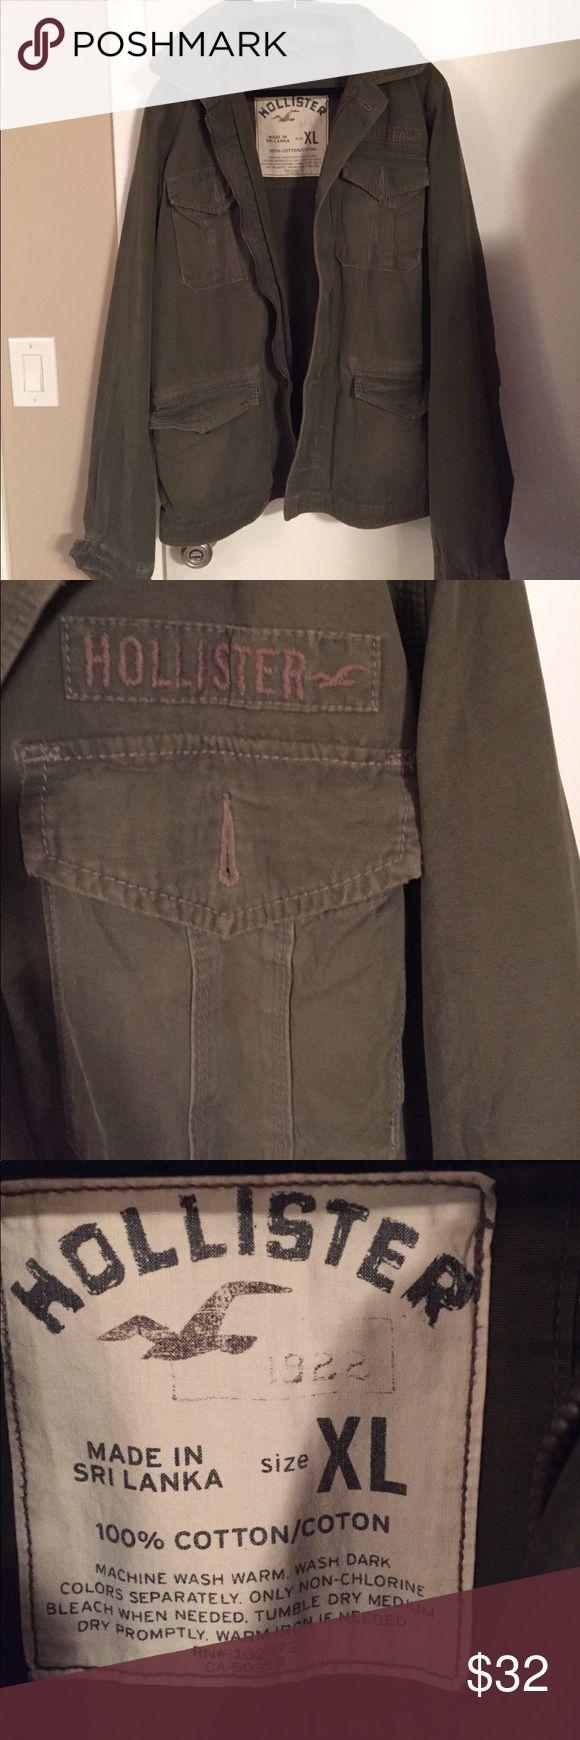 XL Hollister Jacket Hardly worn green jacket with 4 pockets and zipper closure Hollister Jackets & Coats